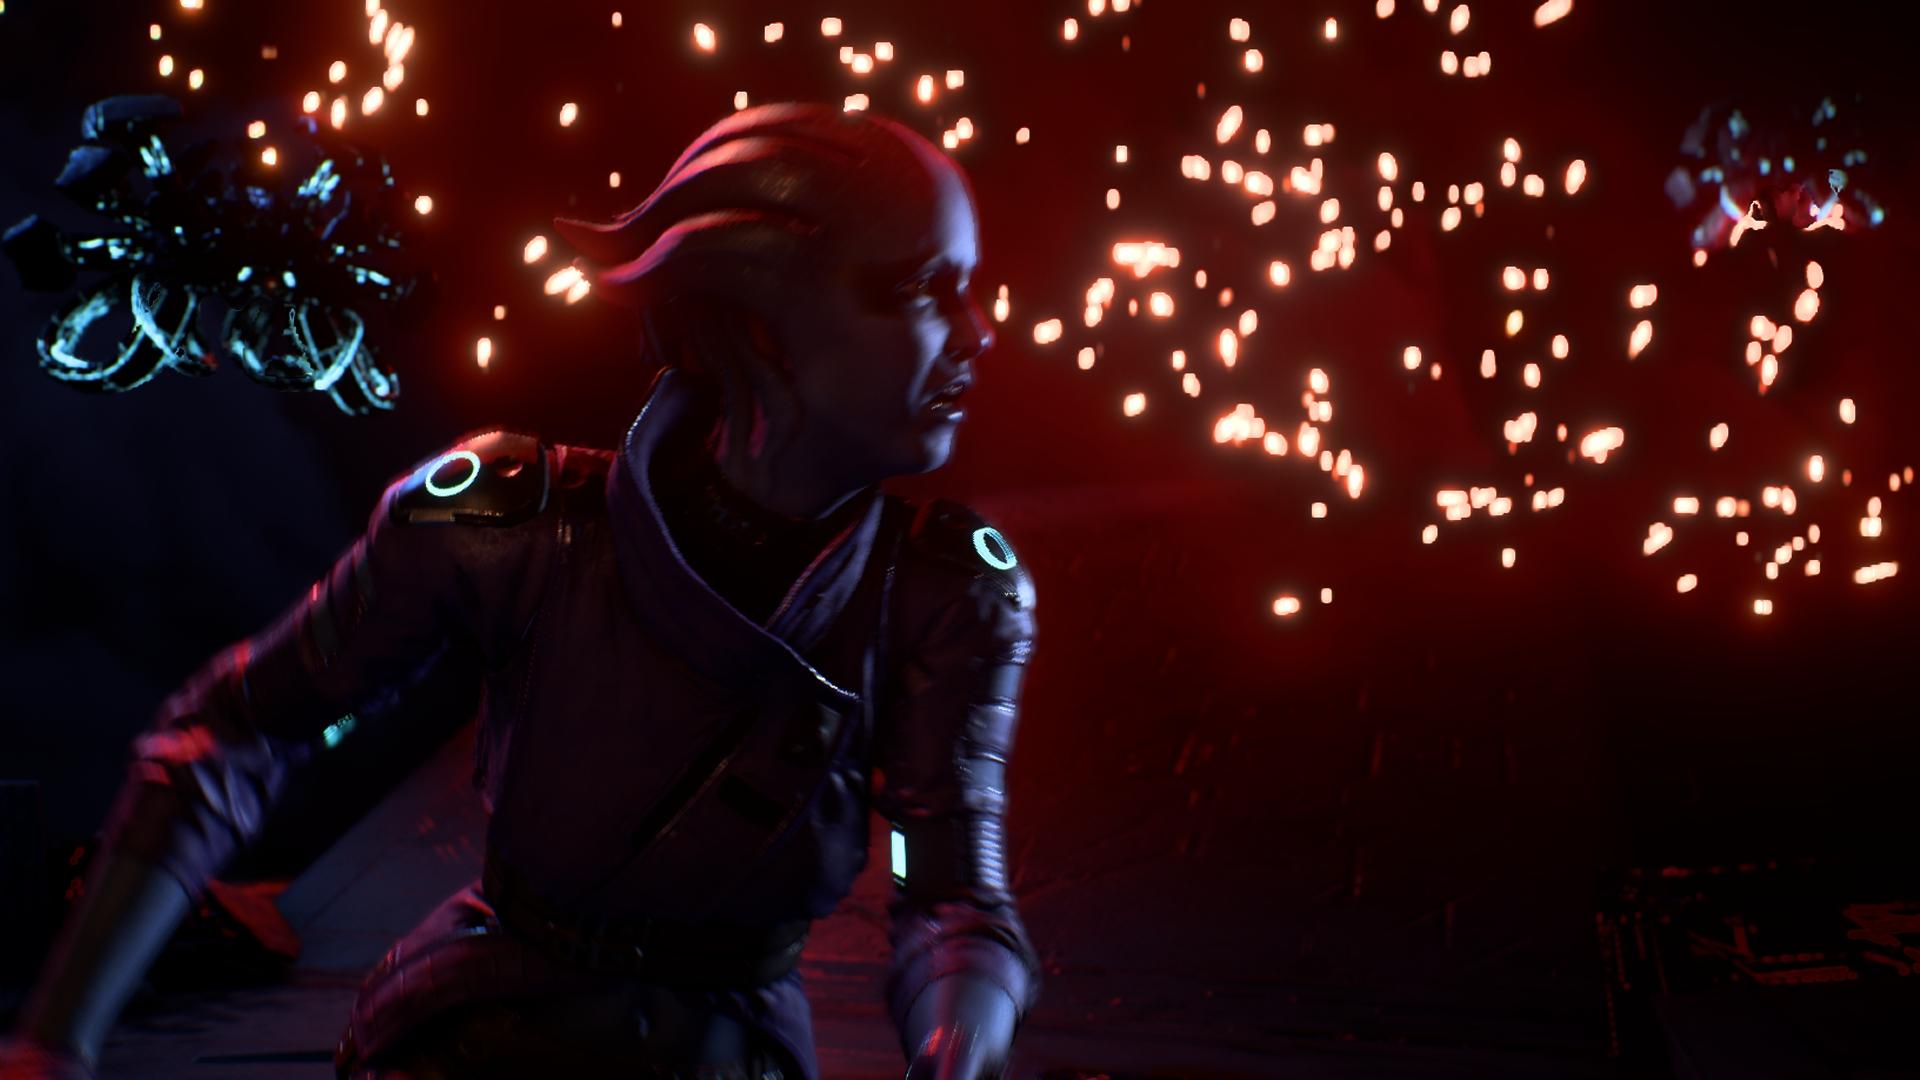 MassEffectAndromeda 2017-04-10 17-18-22-323.jpg - Mass Effect: Andromeda